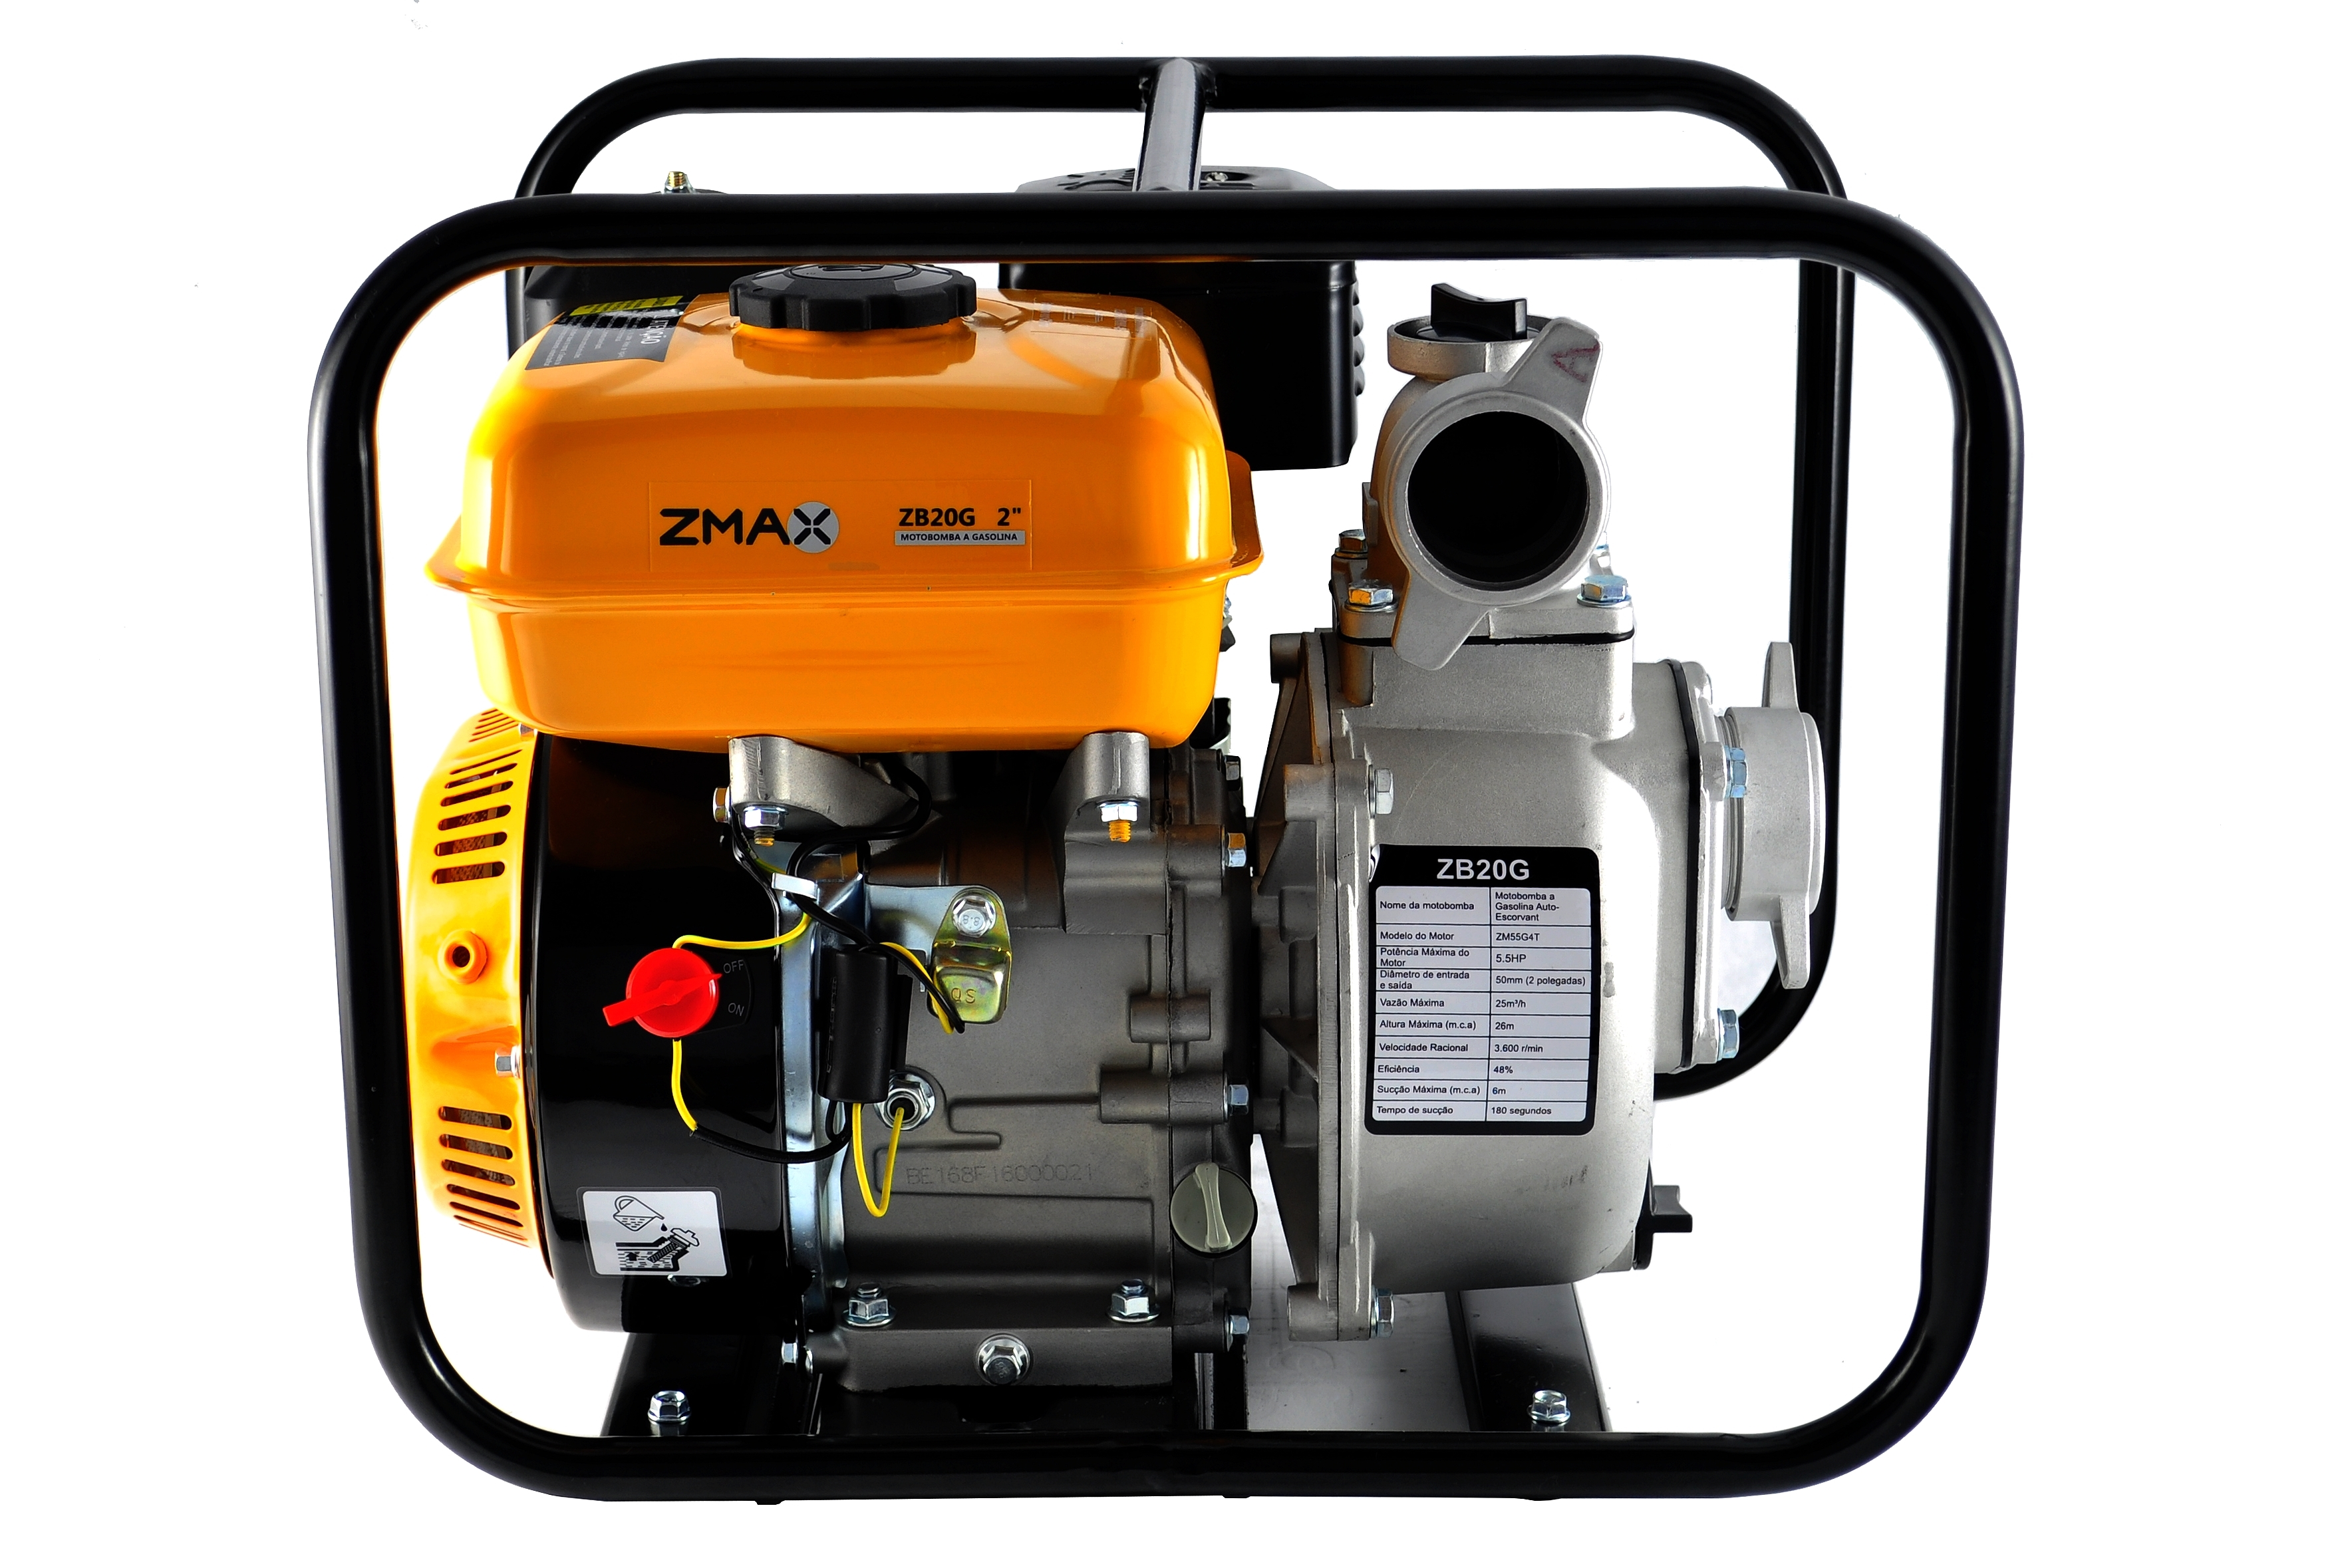 Motobomba a Gasolina - ZB20G